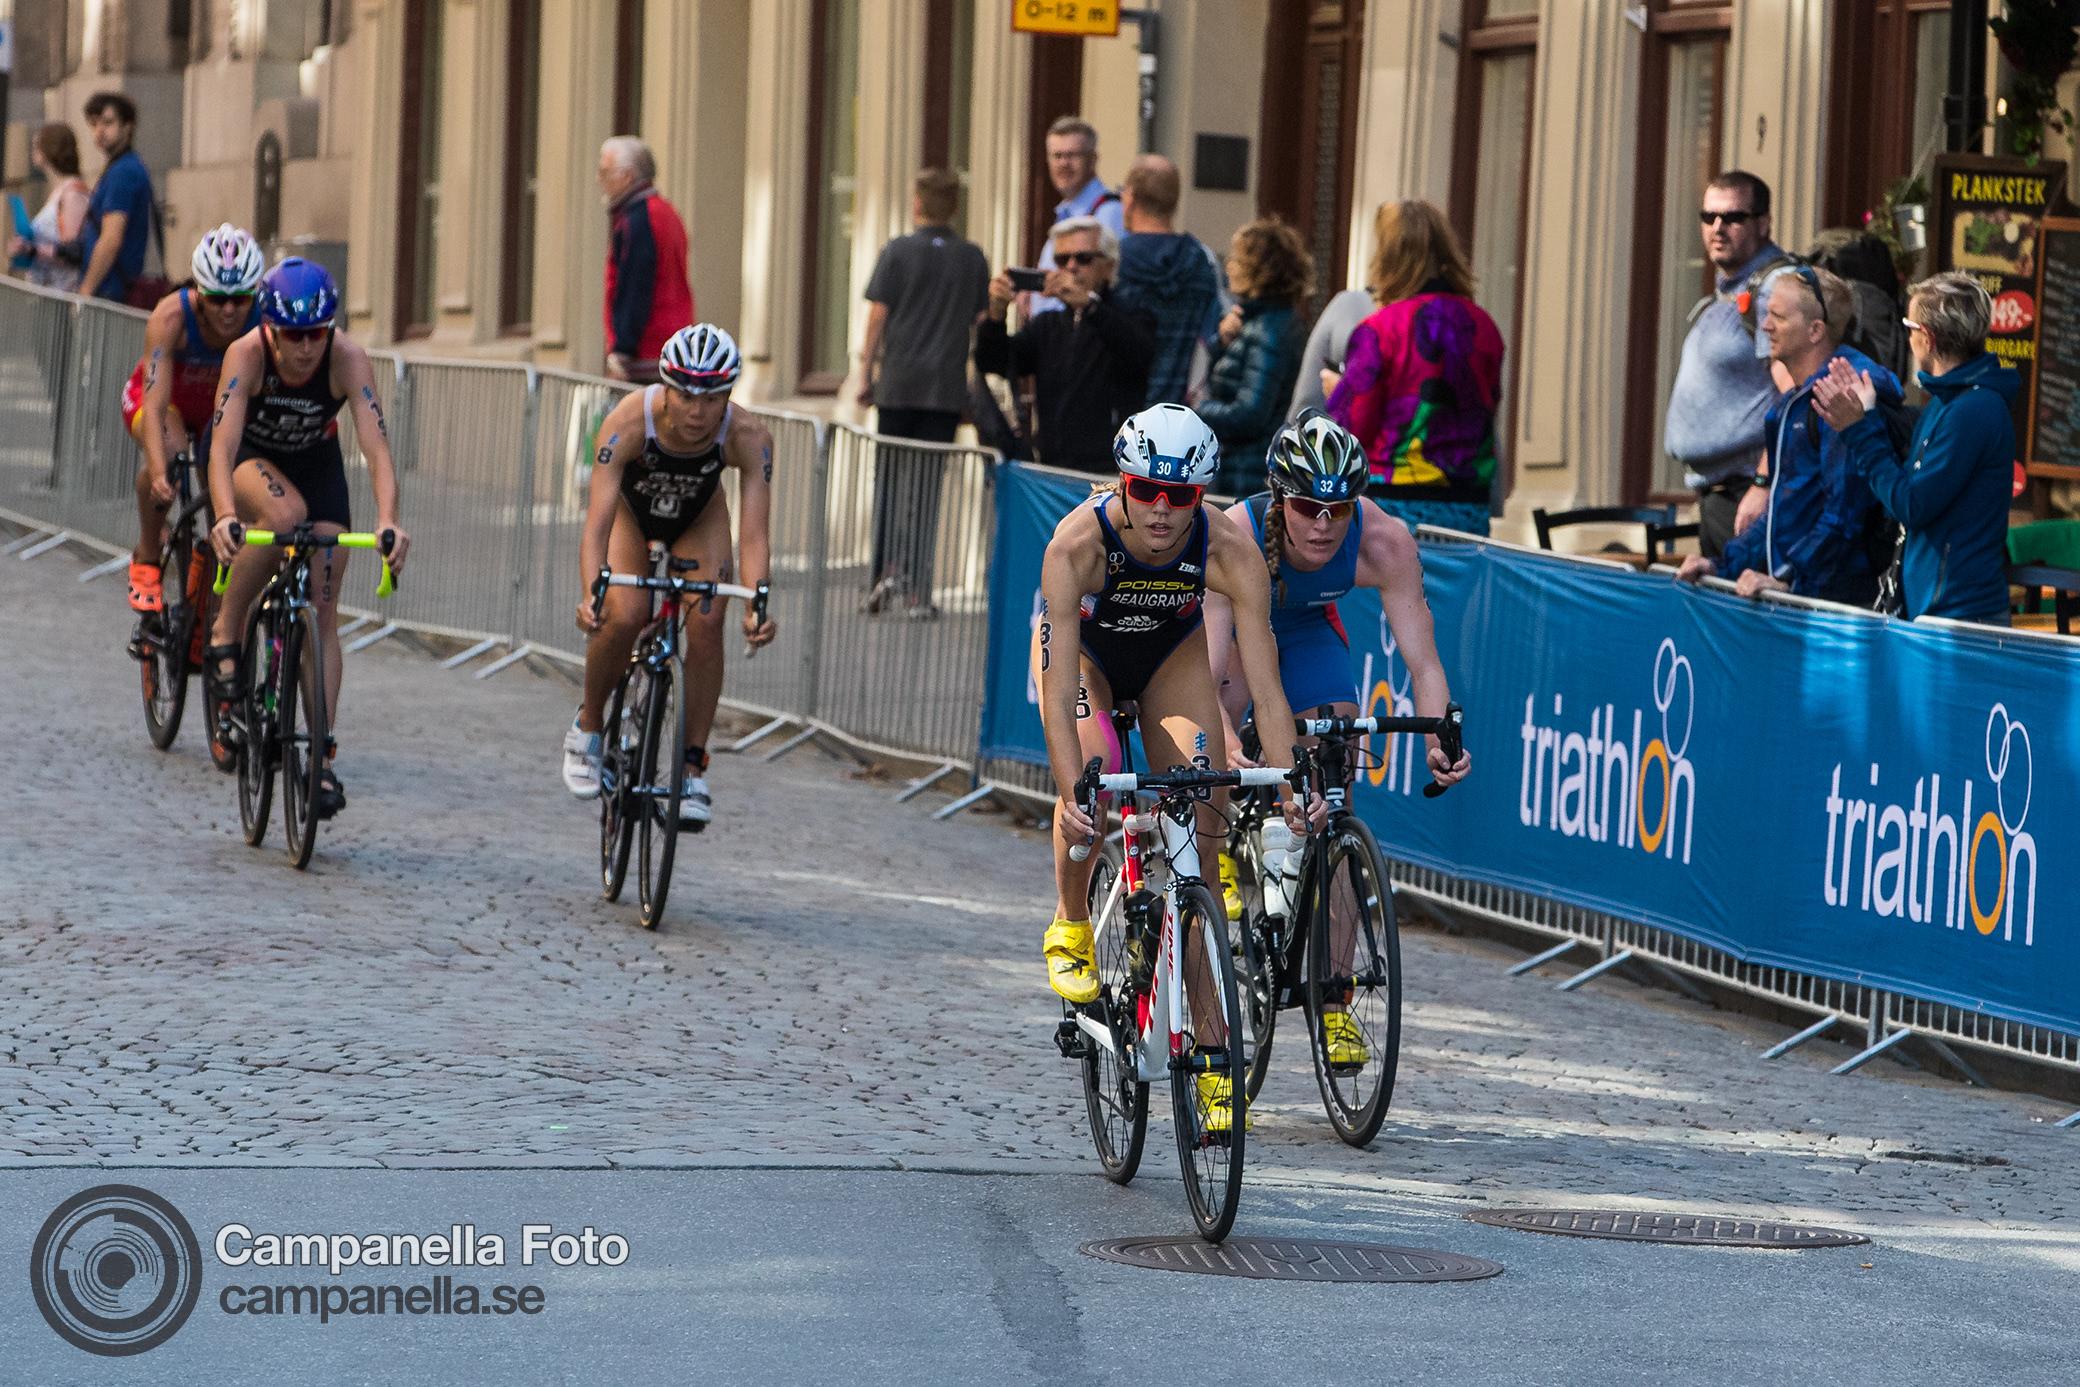 World Triathlon Series Stockholm - Michael Campanella Photography